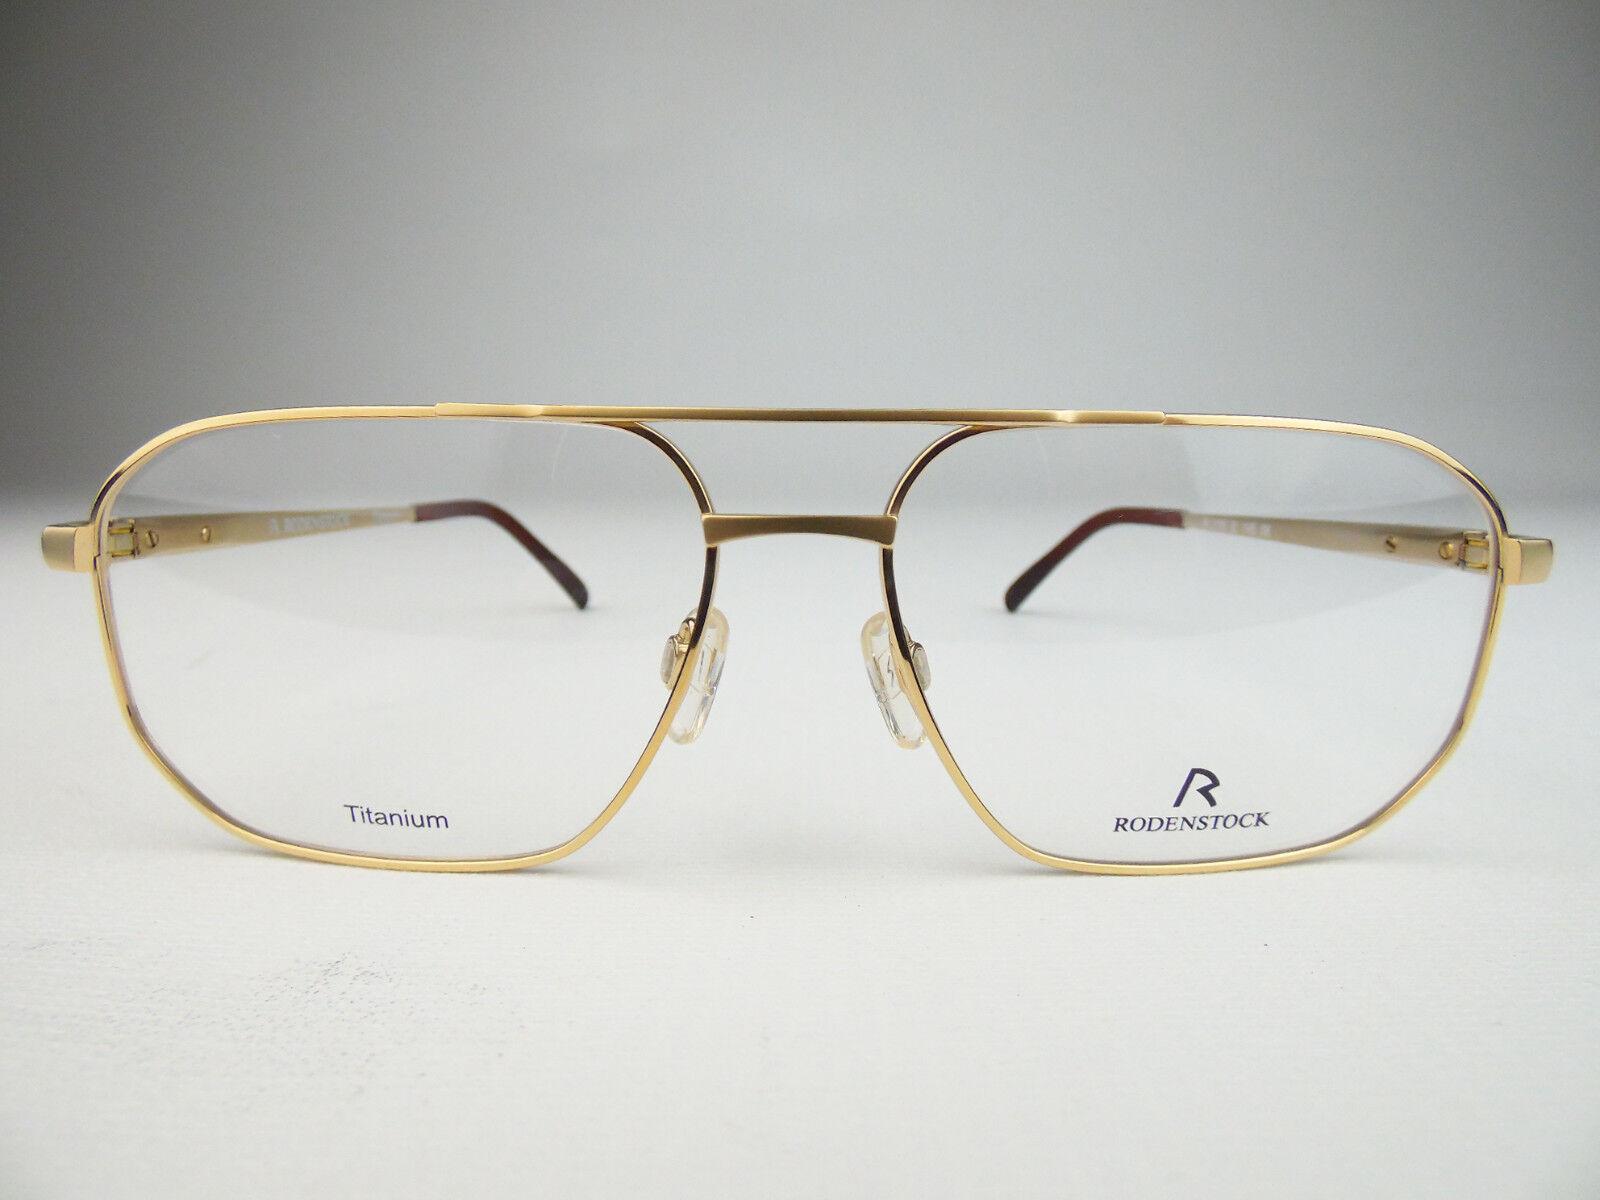 RODENSTOCK R2105 TITANIUM GERMANY Designer Brille eyeglasses frame goggles NEW